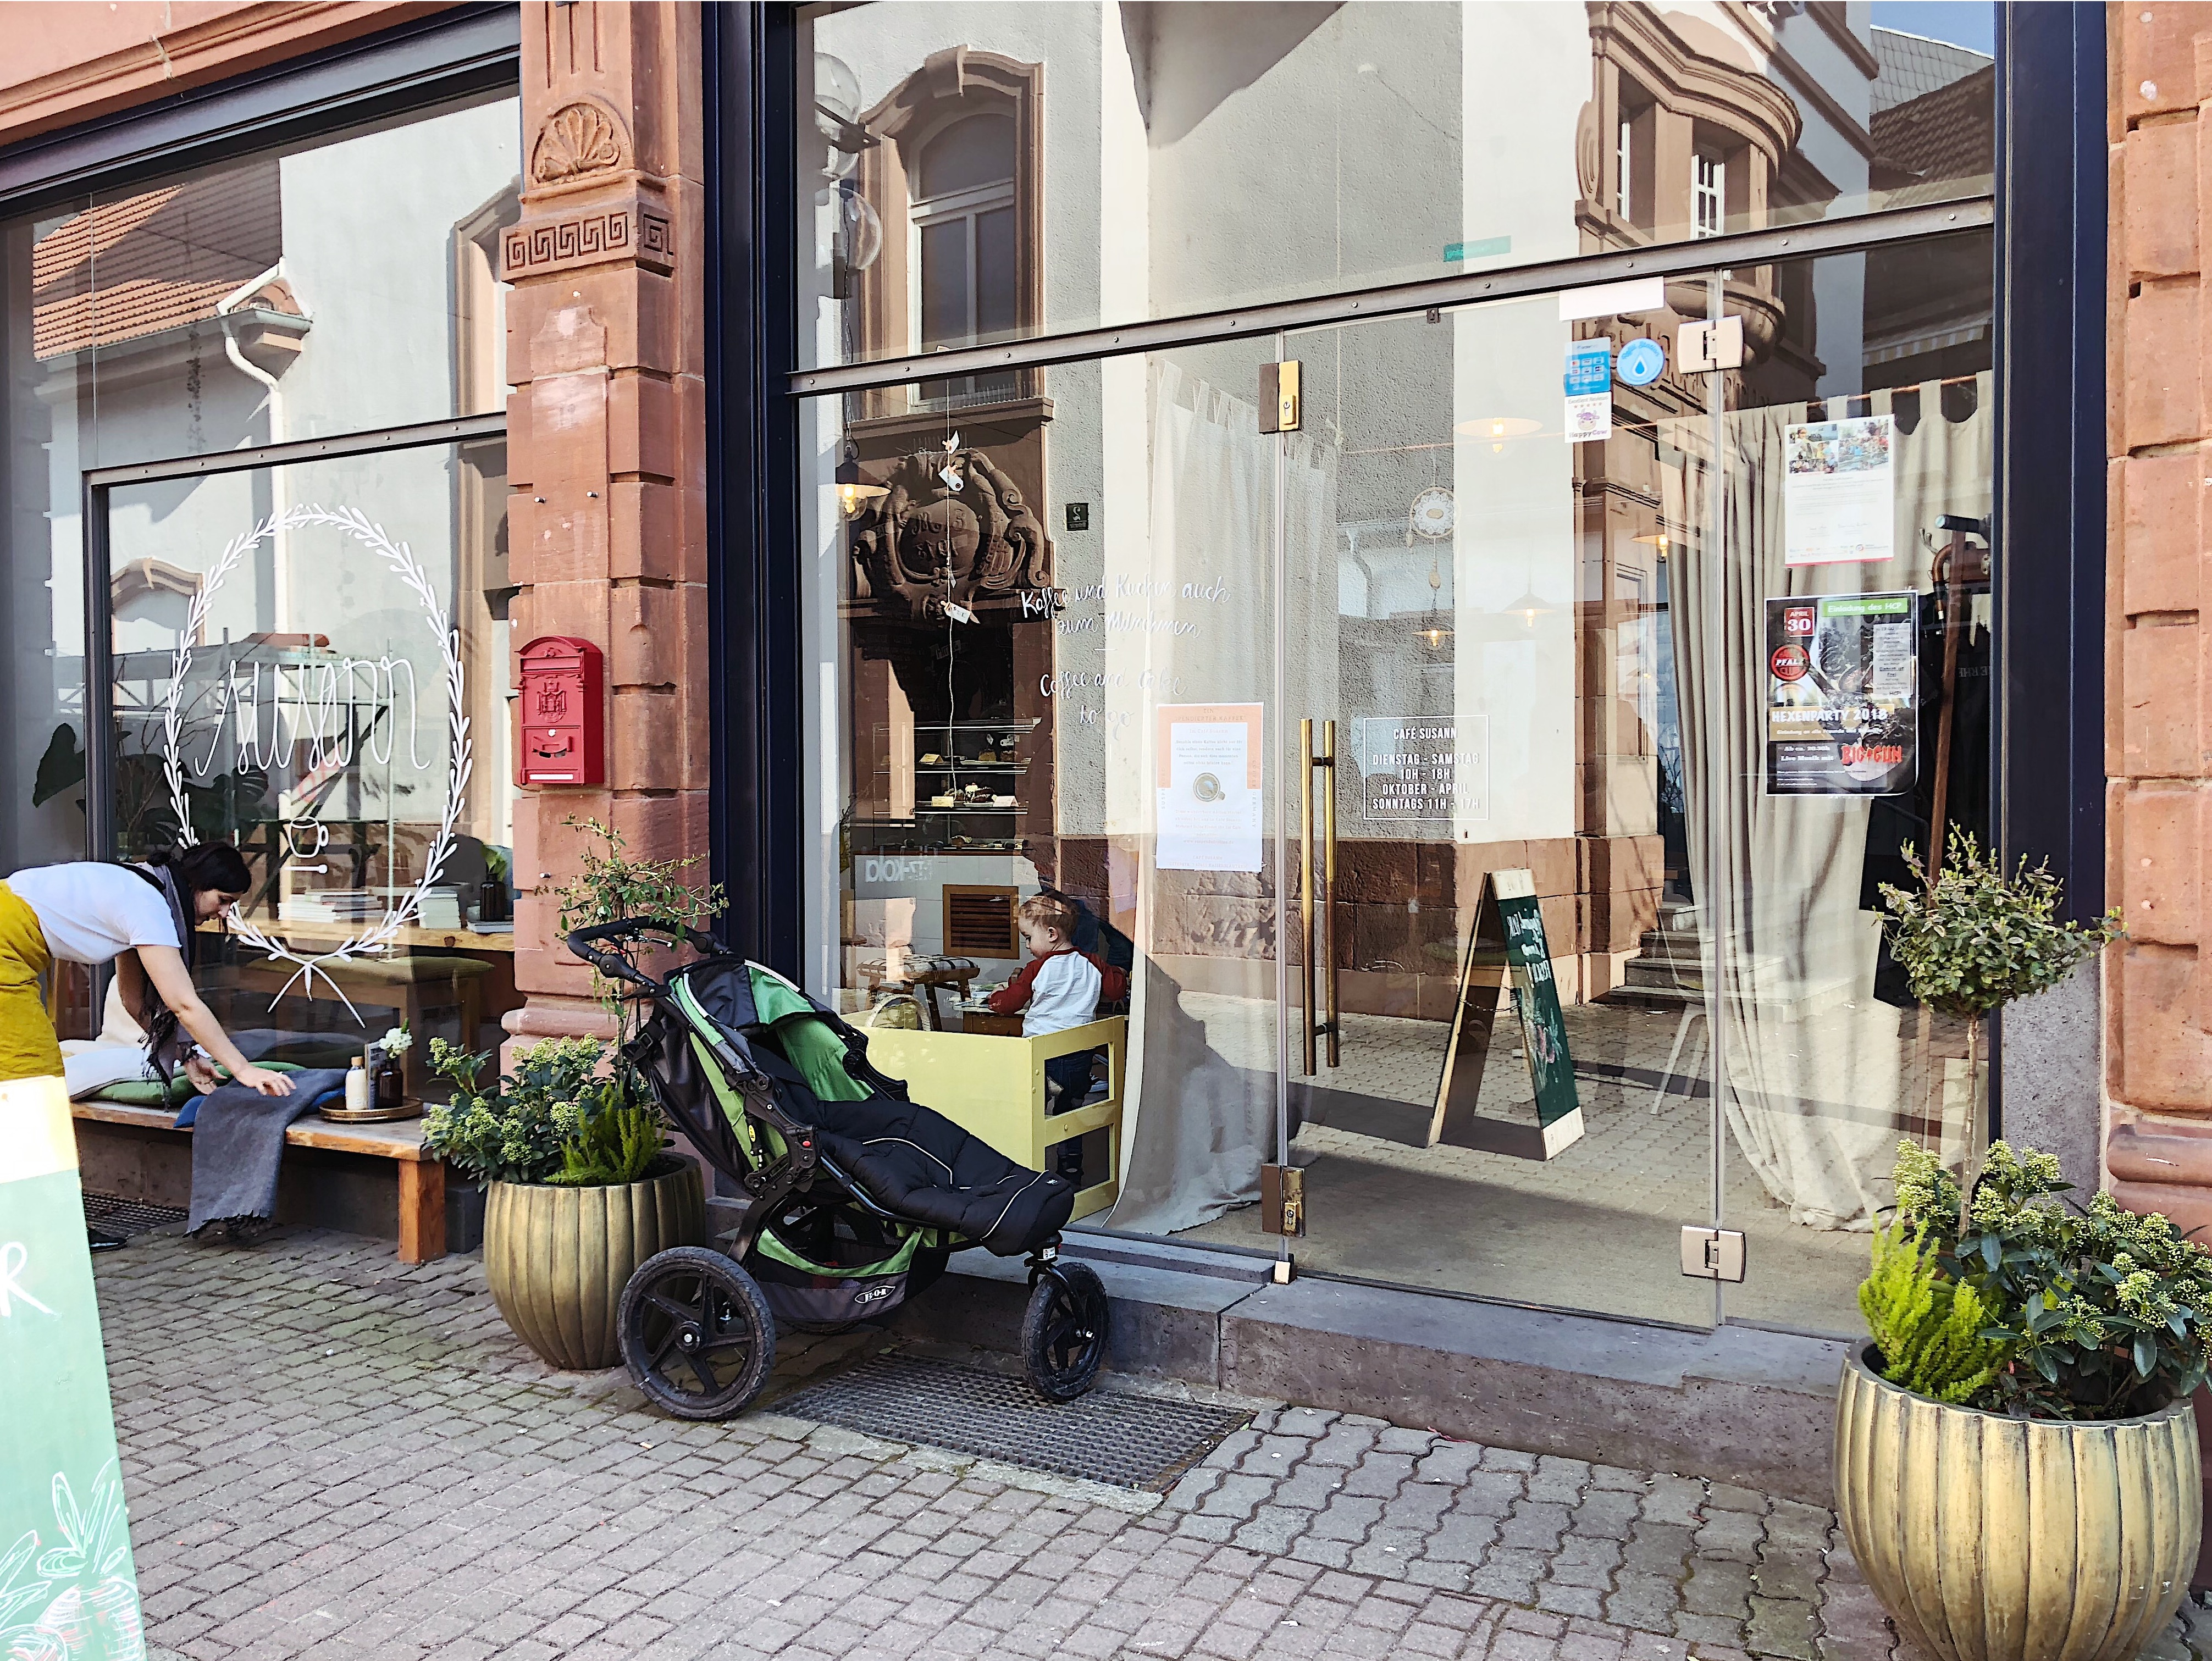 cafe-susann-kaiserslautern-street-view